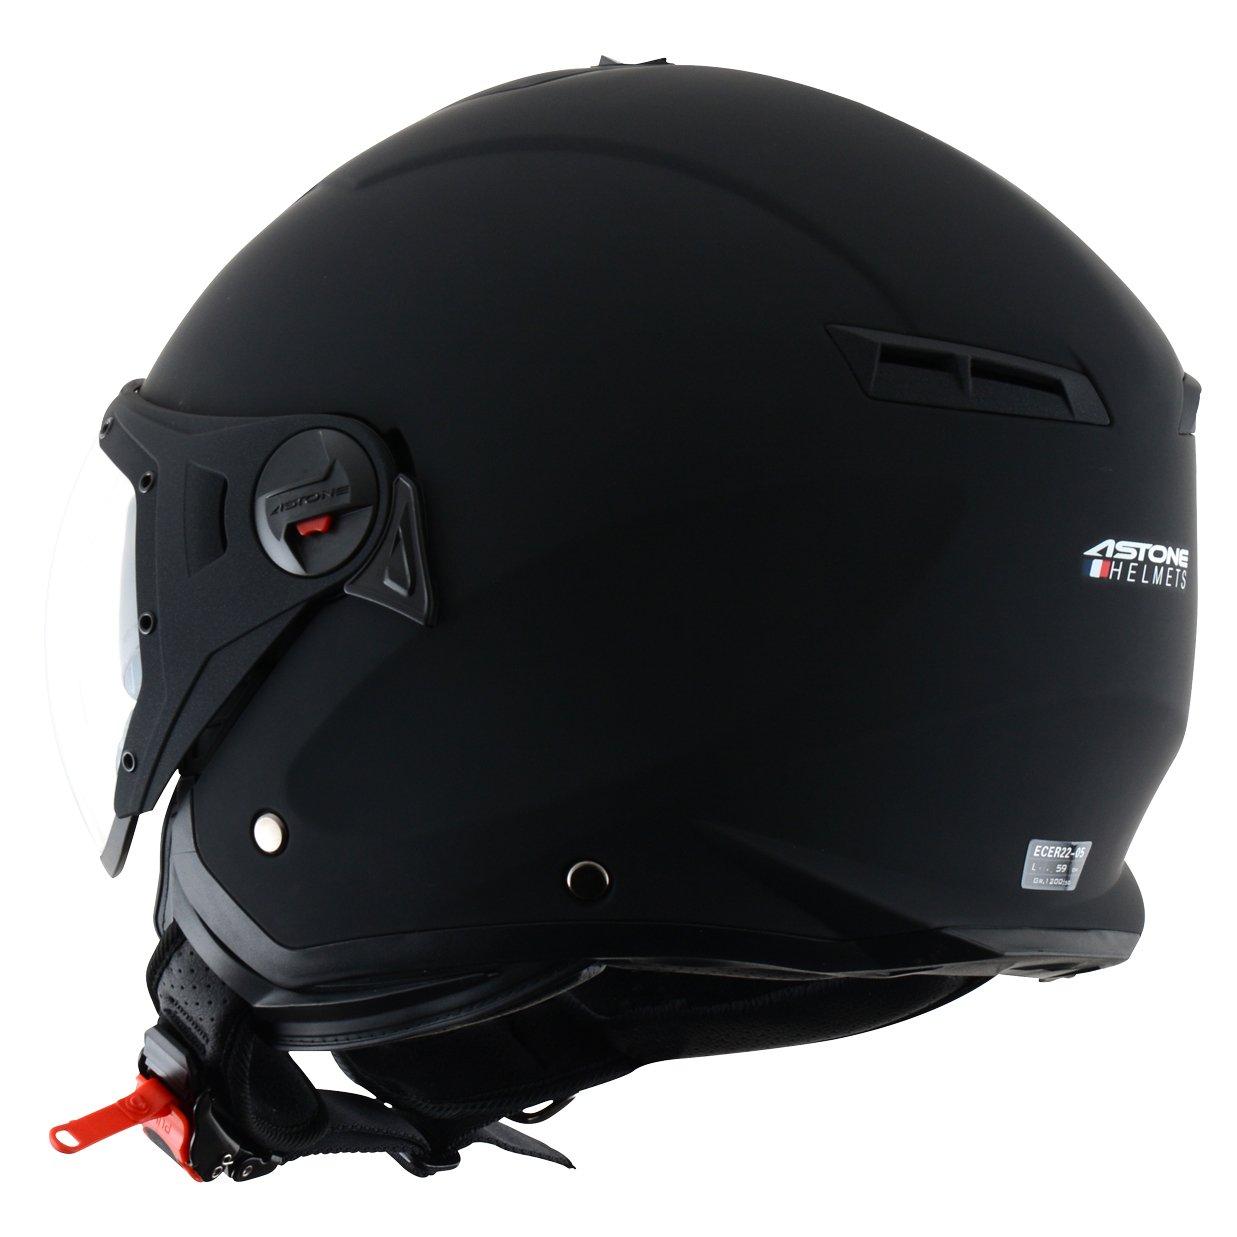 Casque de scooter mixte Casque jet compact Matt black MINIJET S SPORT monocolor Casque en polycarbonate Casque de moto look sport Astone Helmets